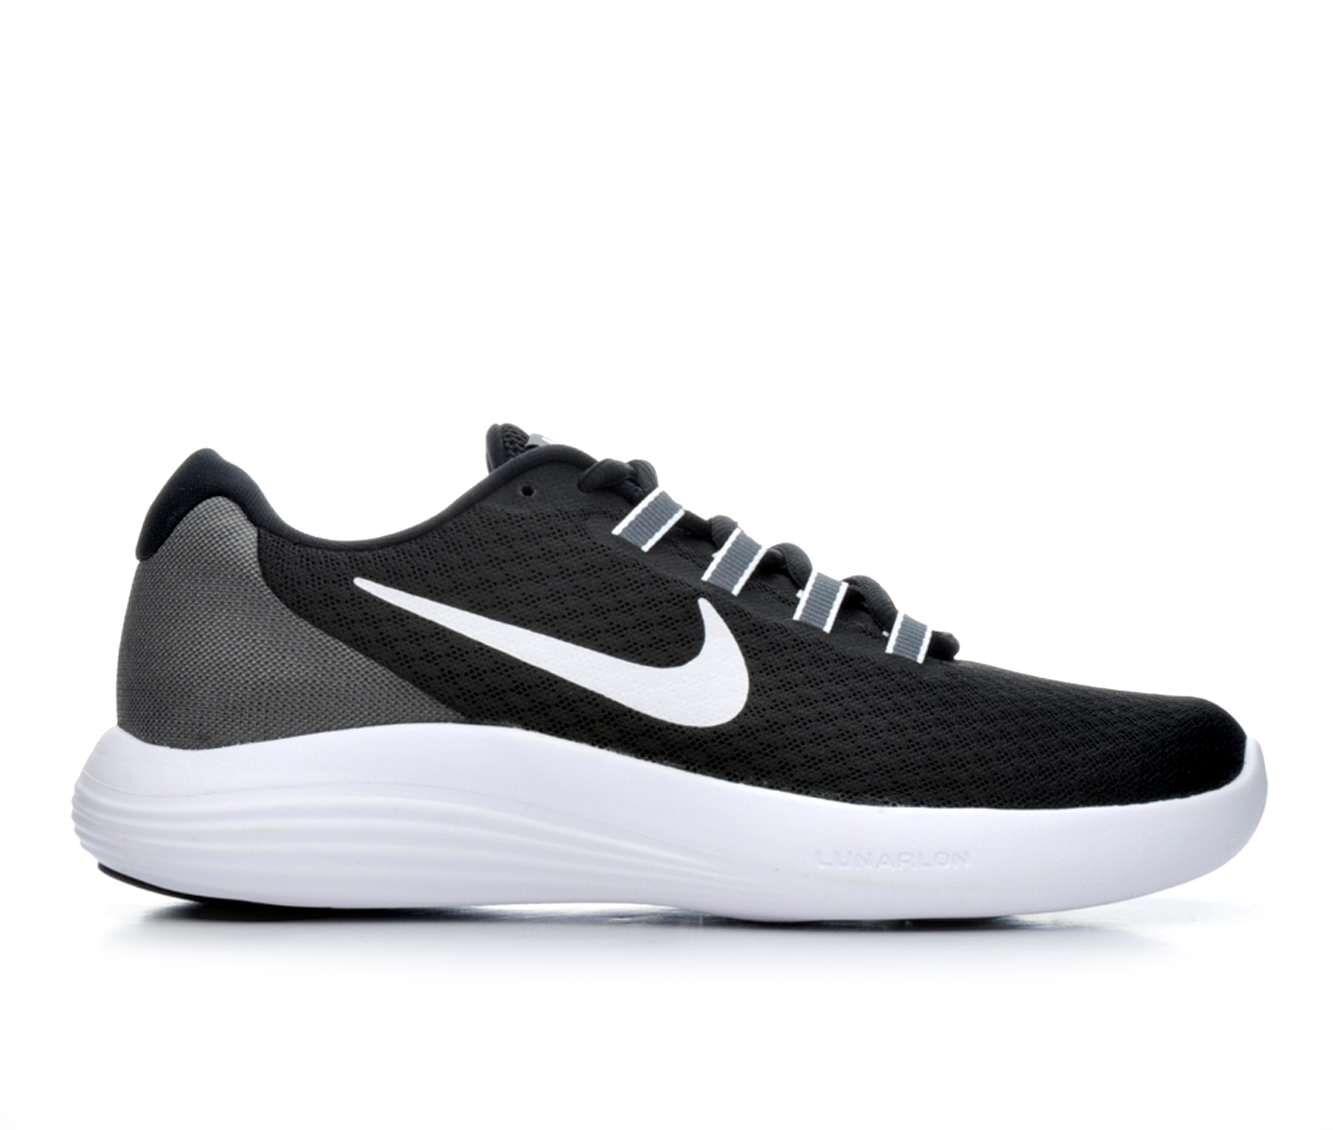 Nike Women's LunarConverge Running Shoes